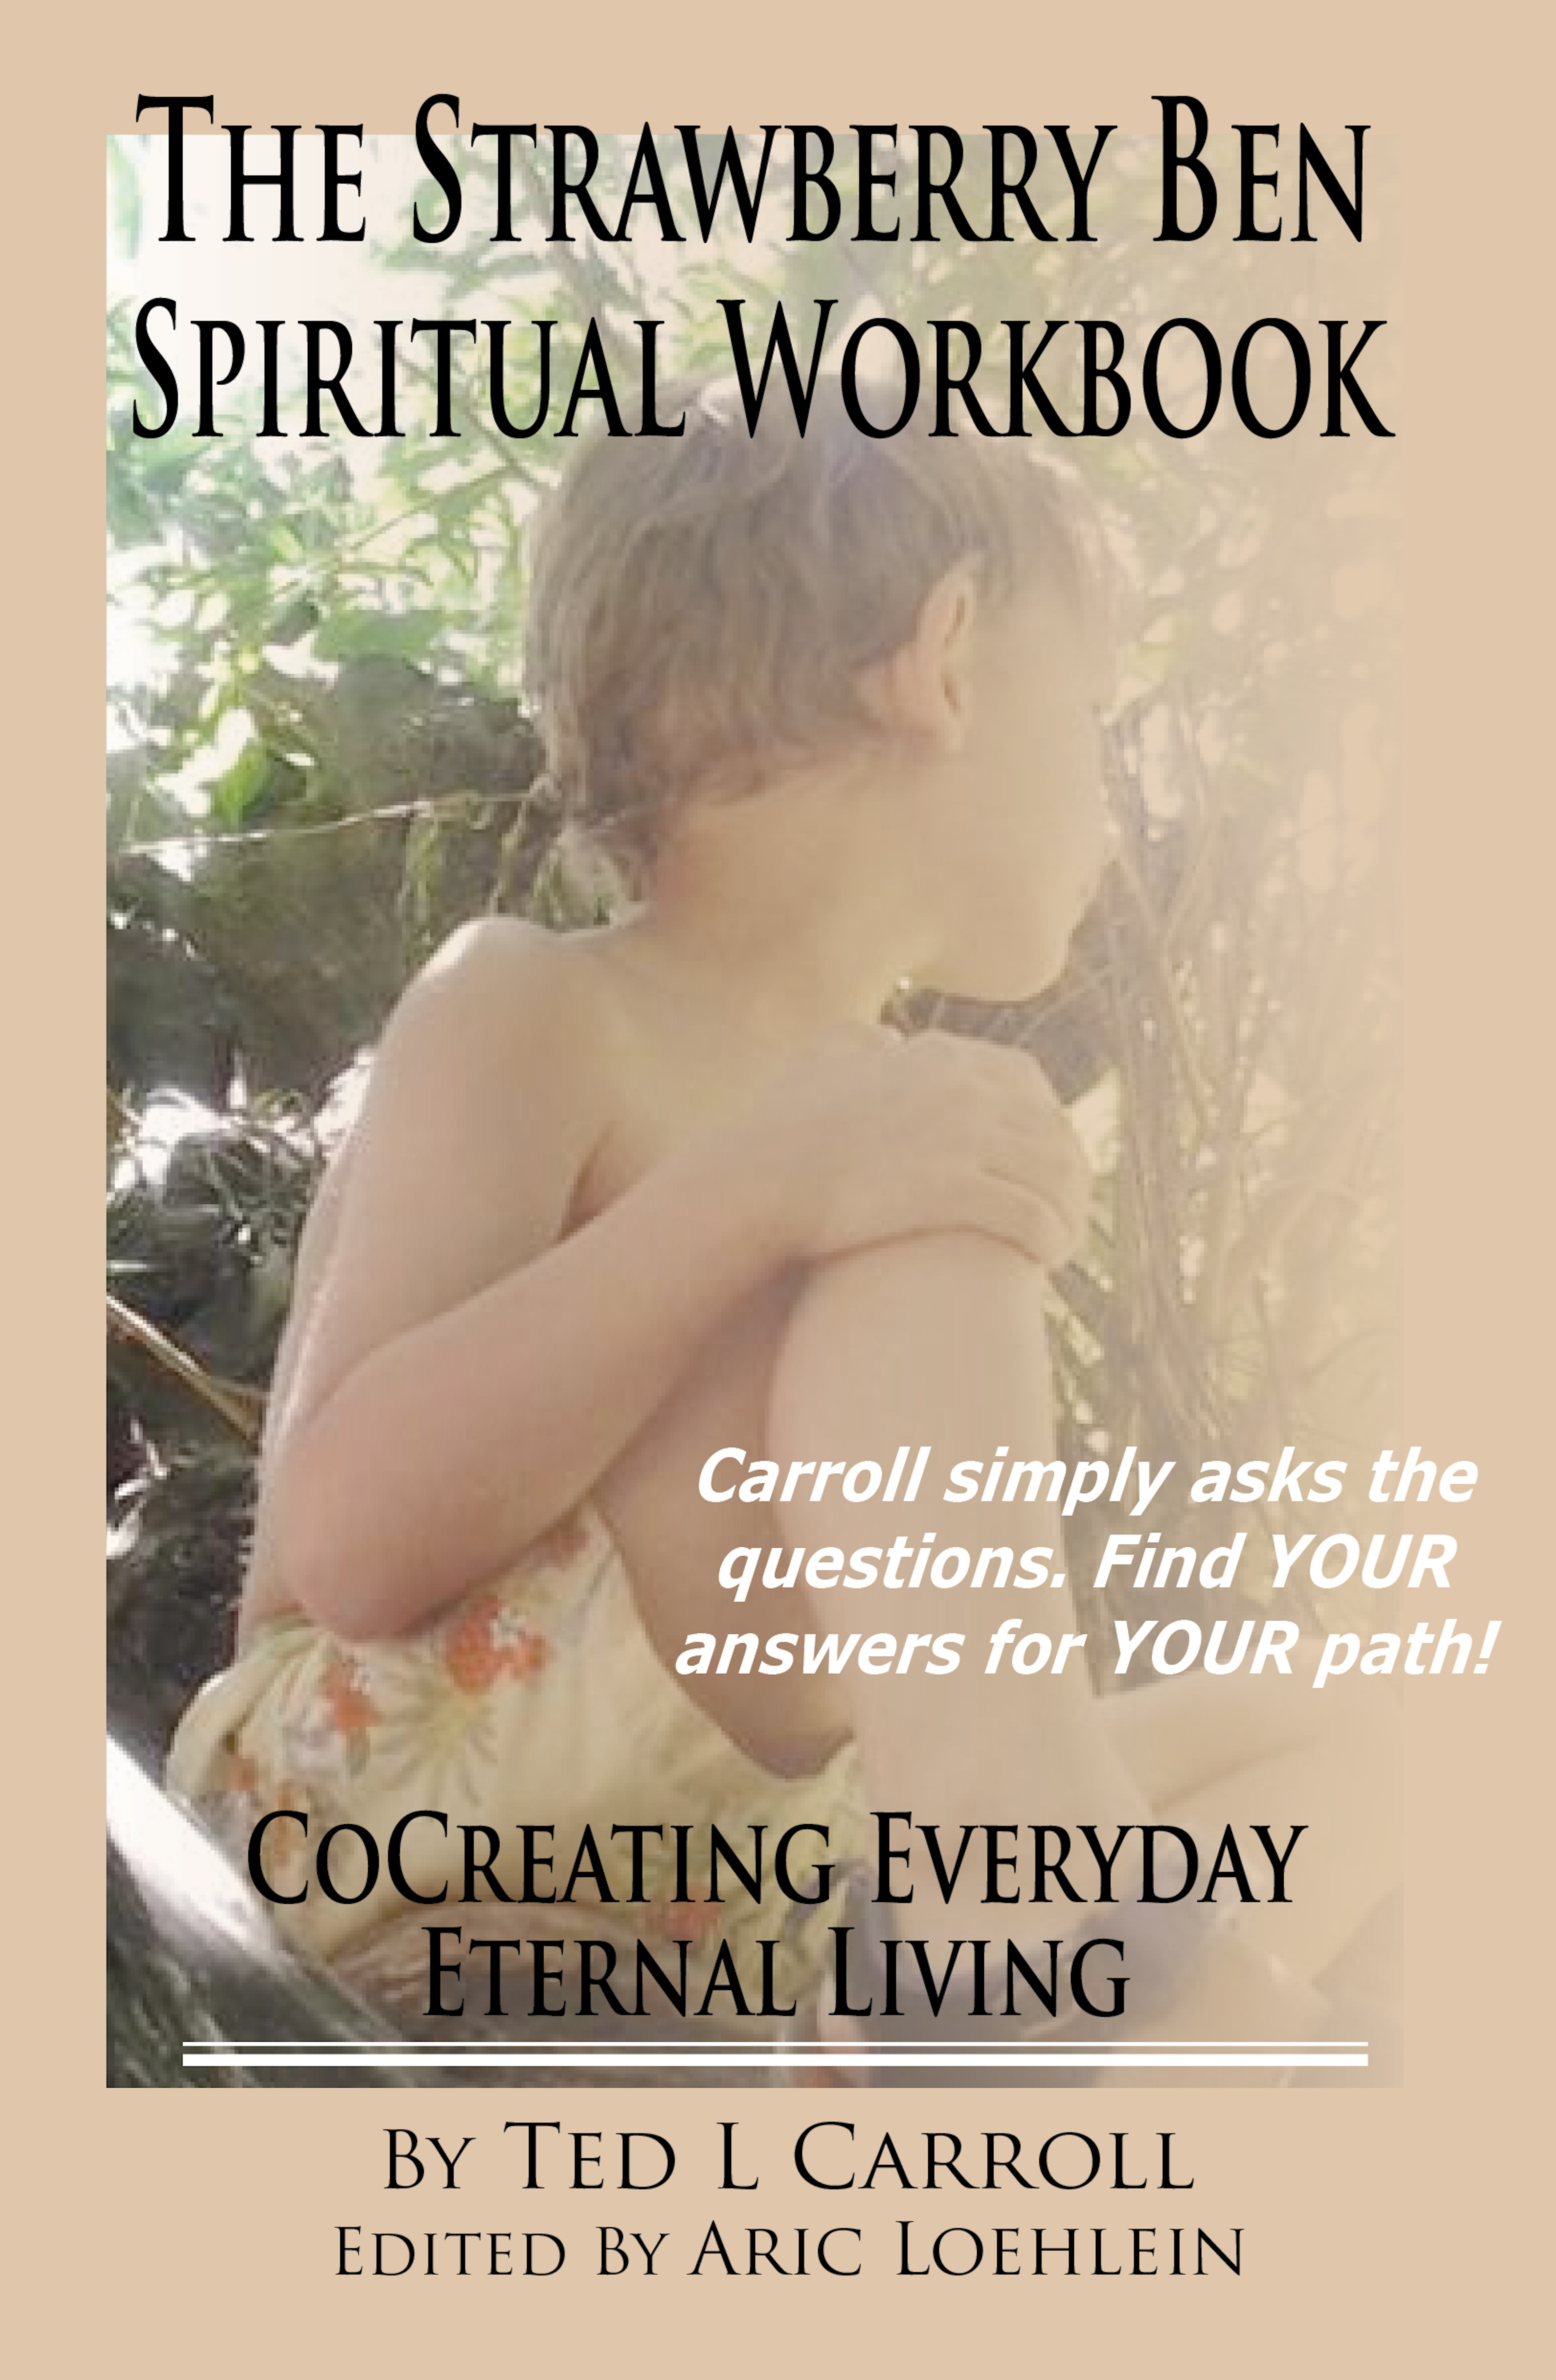 The Strawberry Ben Spiritual Workbook: CoCreating Everyday Eternal Living